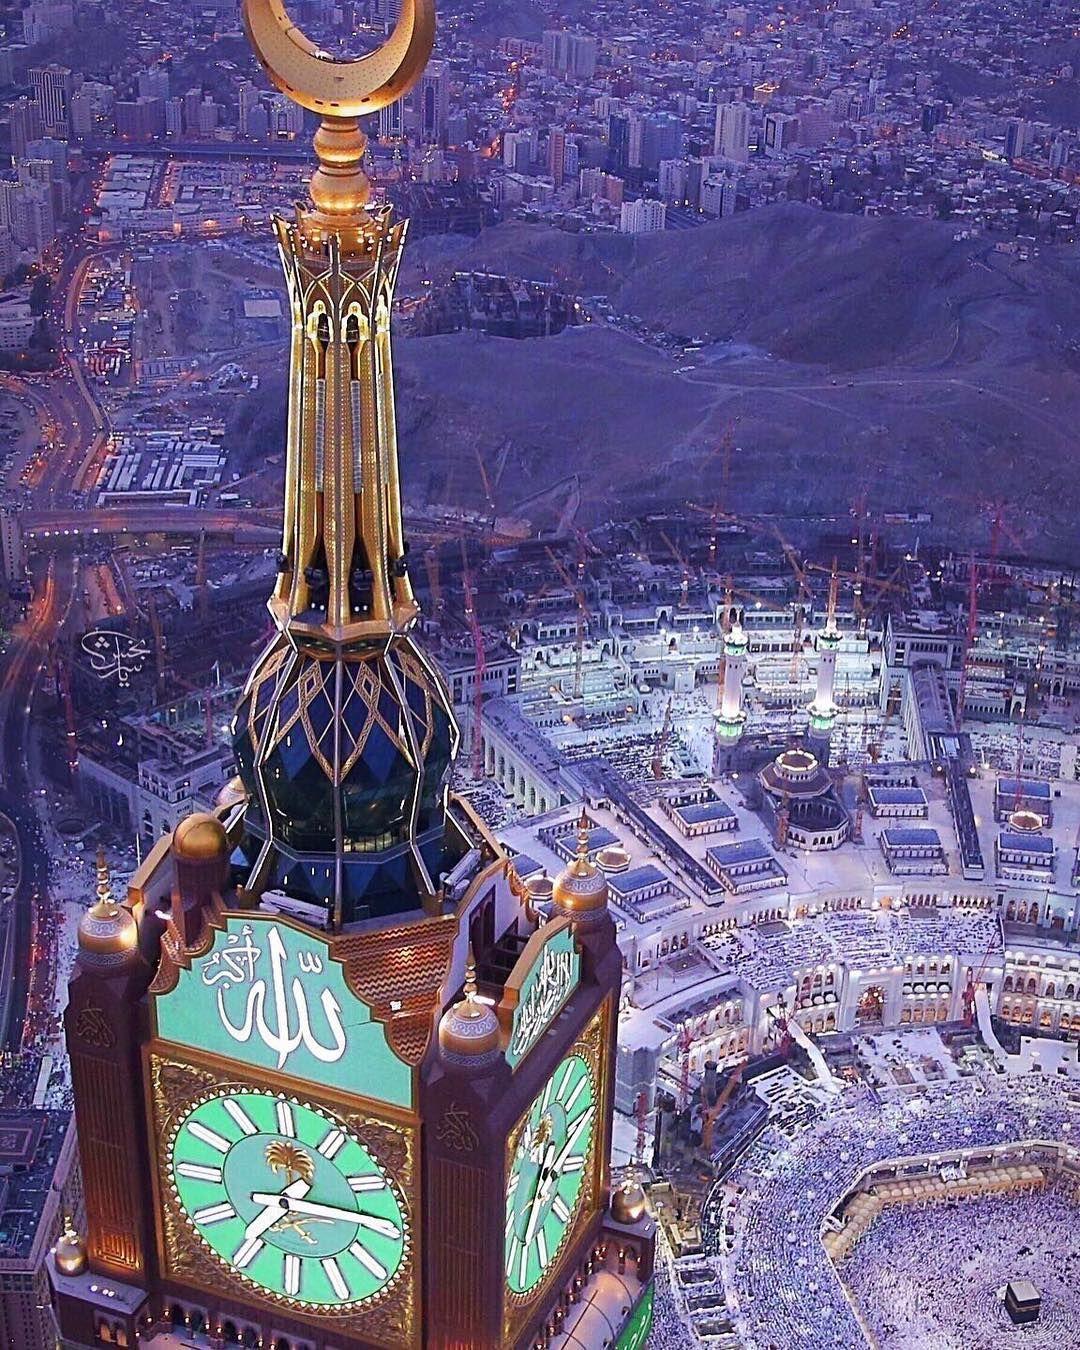 5 آلاف معتكف كانوا بالحرم خلال رمضان رمضان الاعتكاف Arsitektur Islamis Mekah Tempat Ibadah